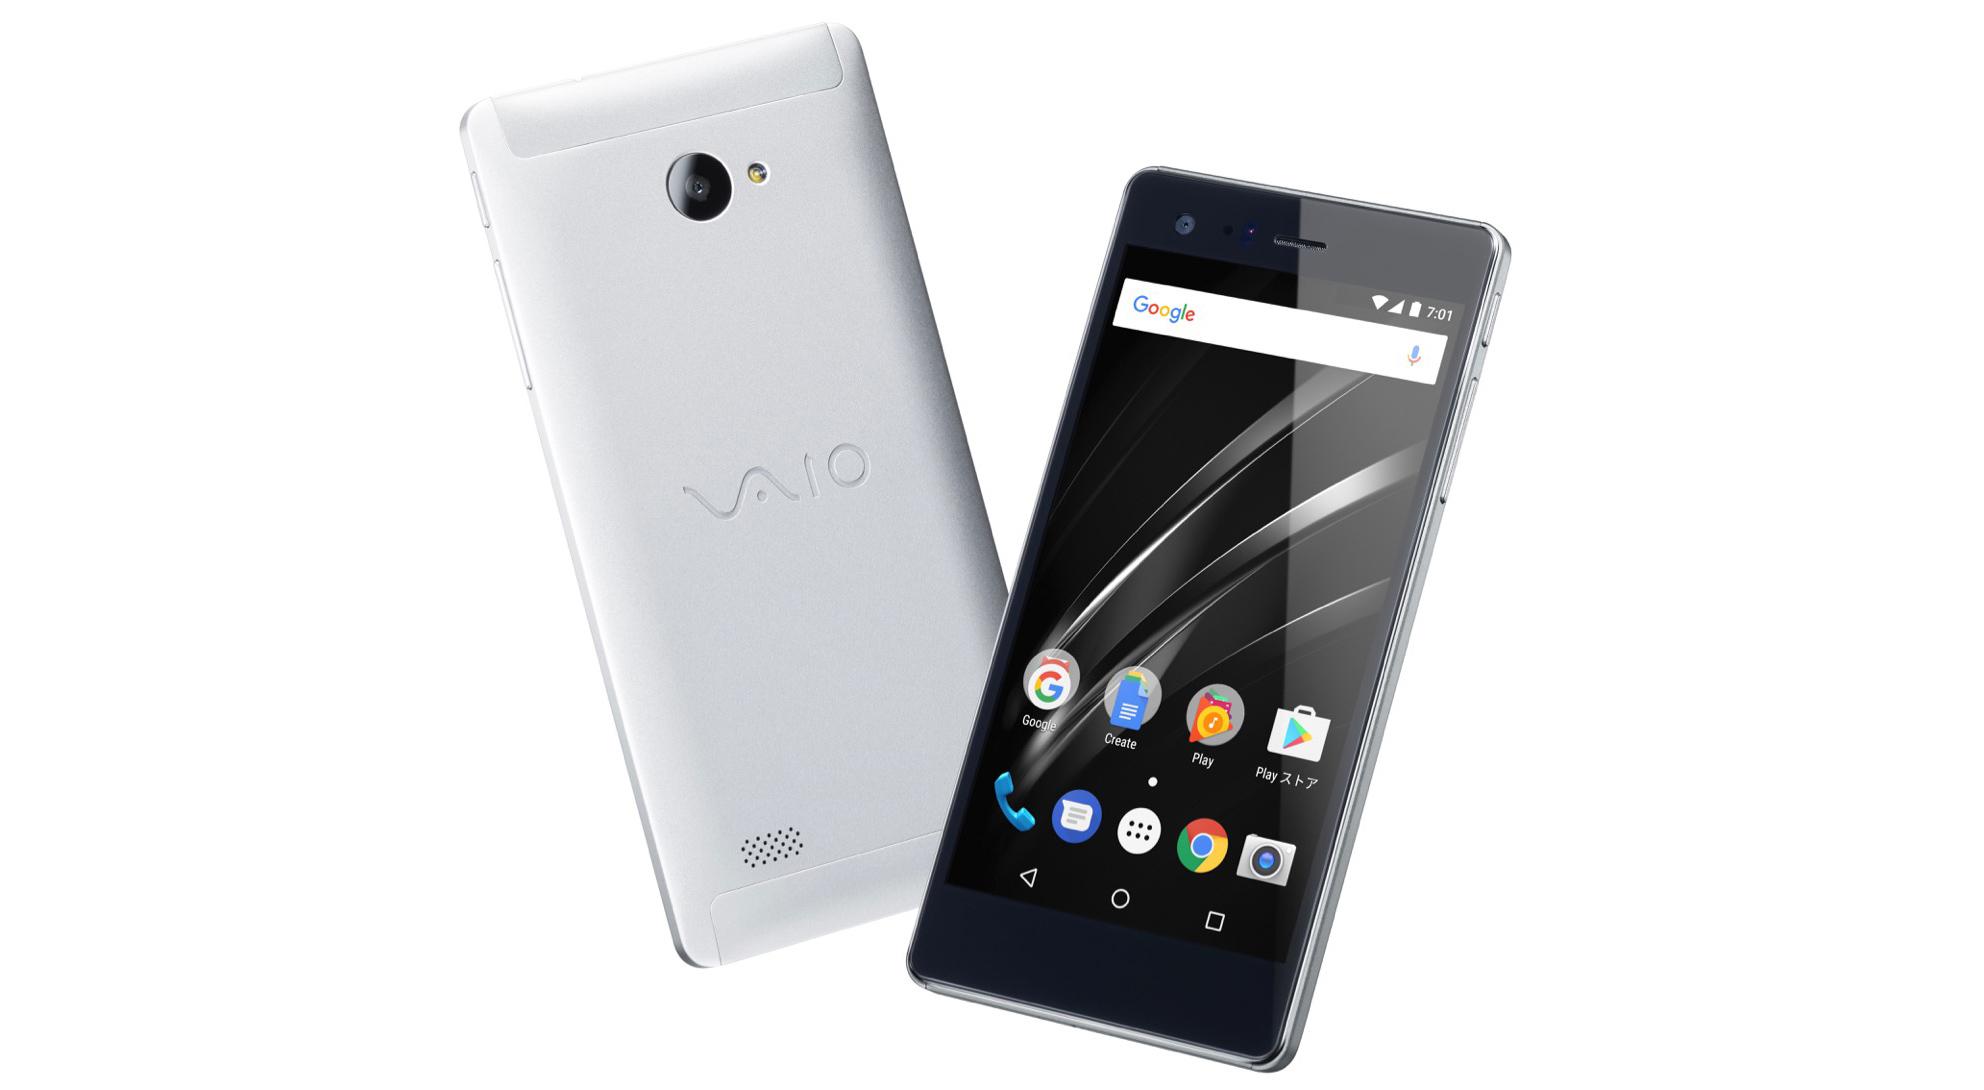 Este bonito VAIO con Windows 10 Mobile ha sido resucitado... para correr Android